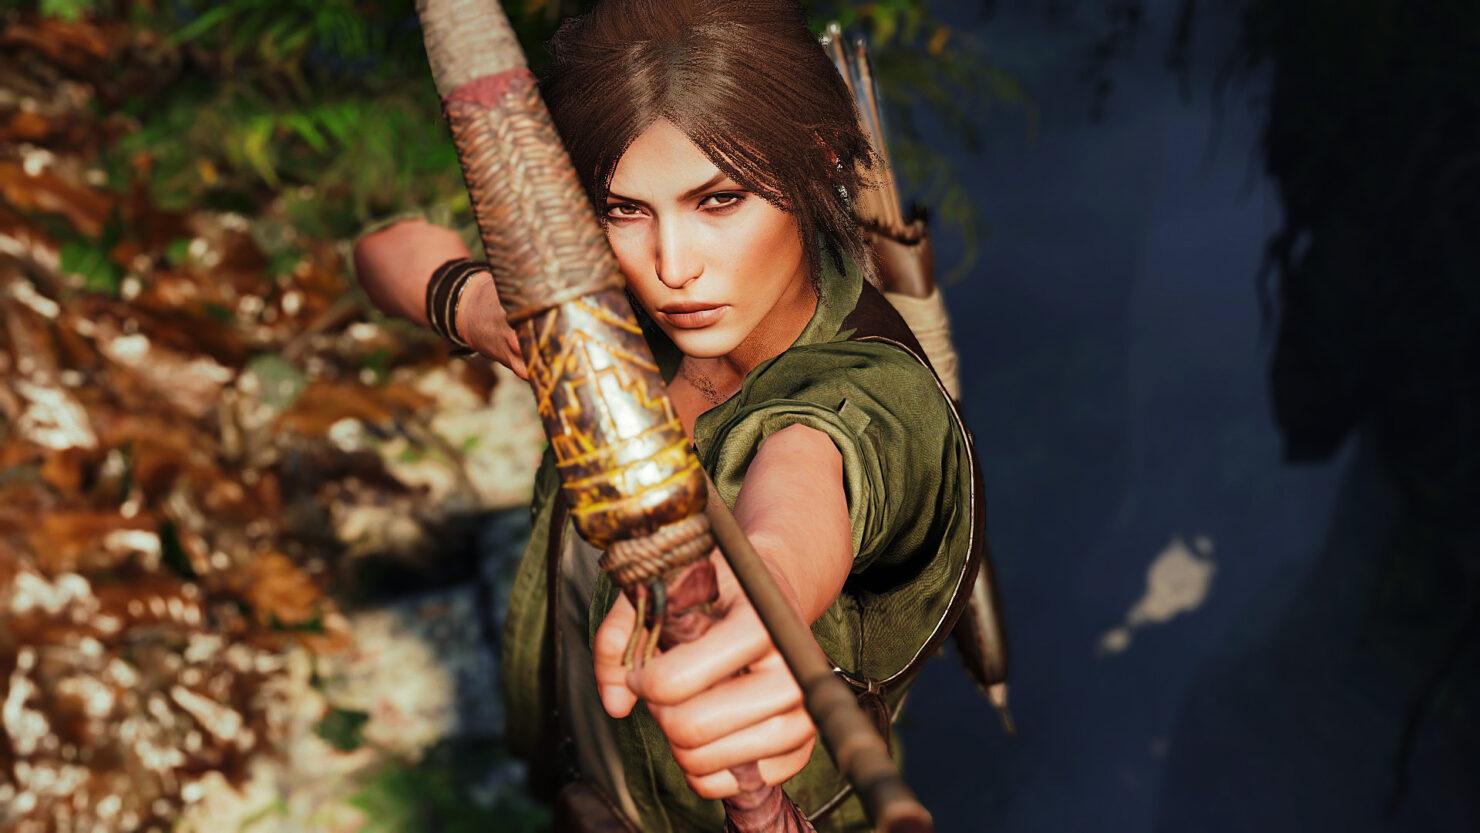 Lara at Shadow of the Tomb Raider Nexus - Mods and community